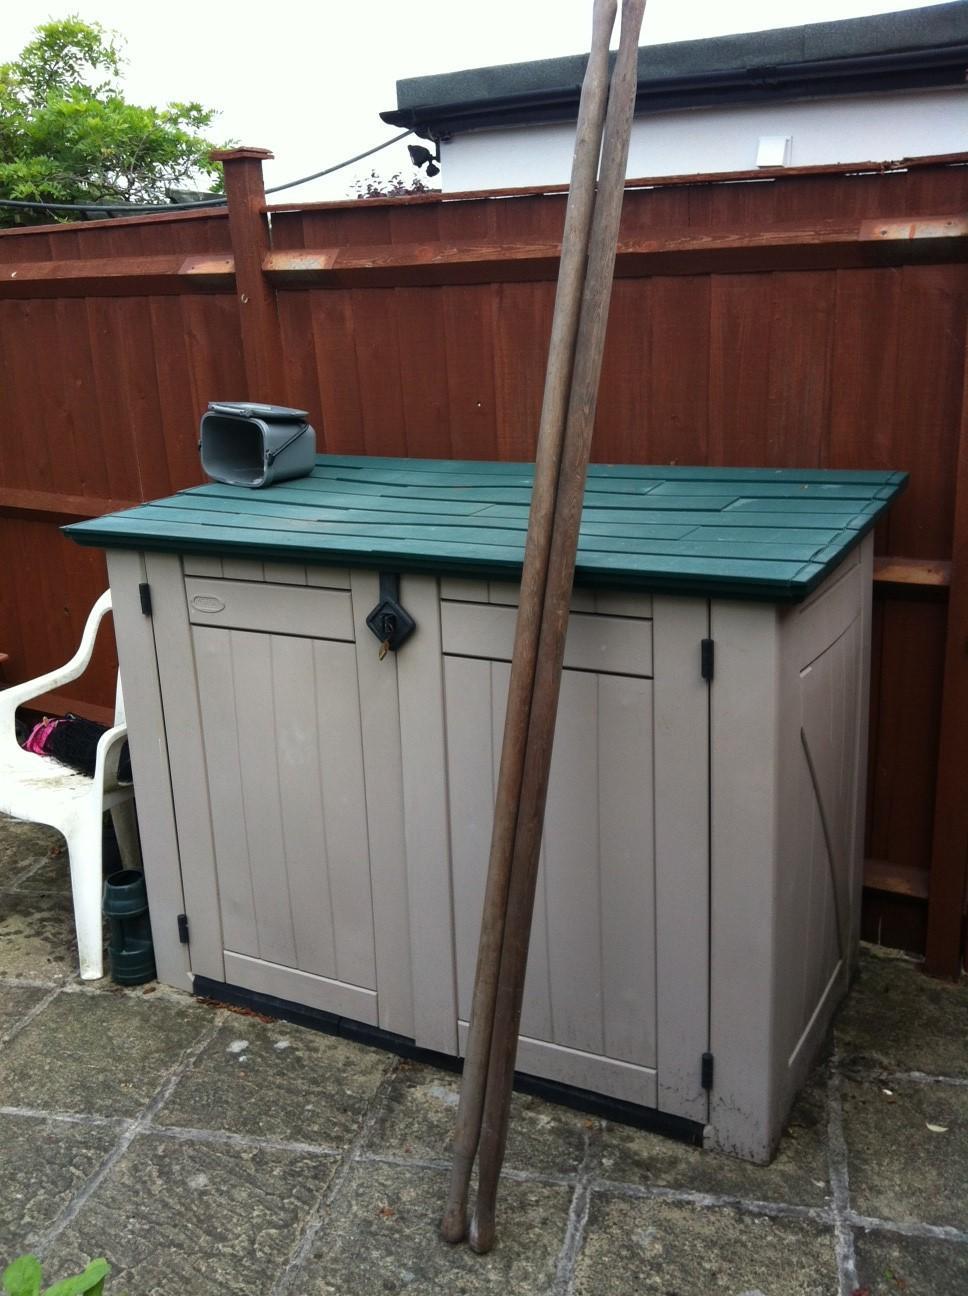 2 x Vintage Wooden Stretcher Poles for sale - nice bargain -